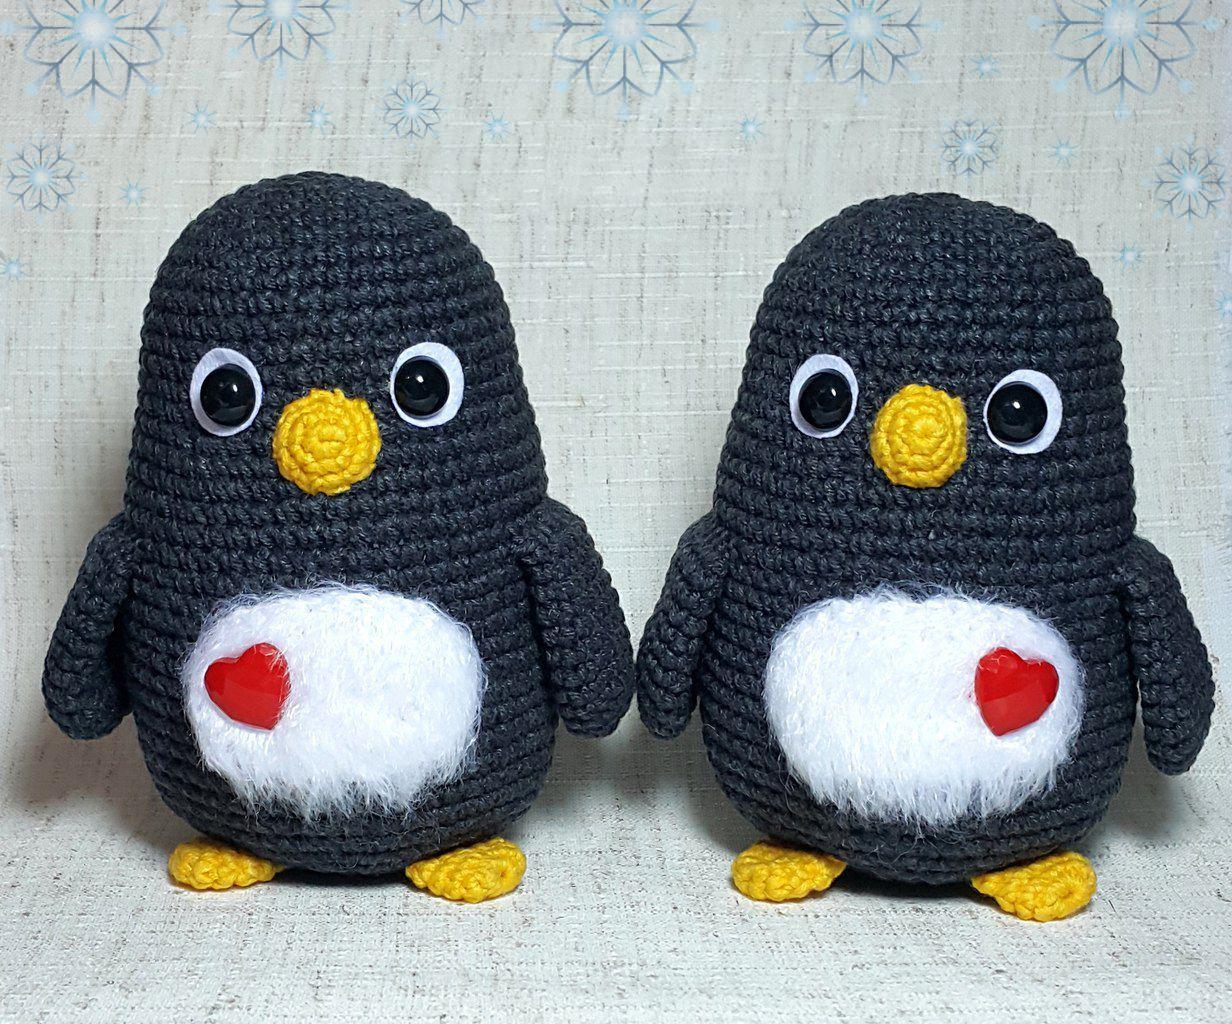 Free penguin crochet pattern! #crochet #amigurumi | dekoraciooo ...